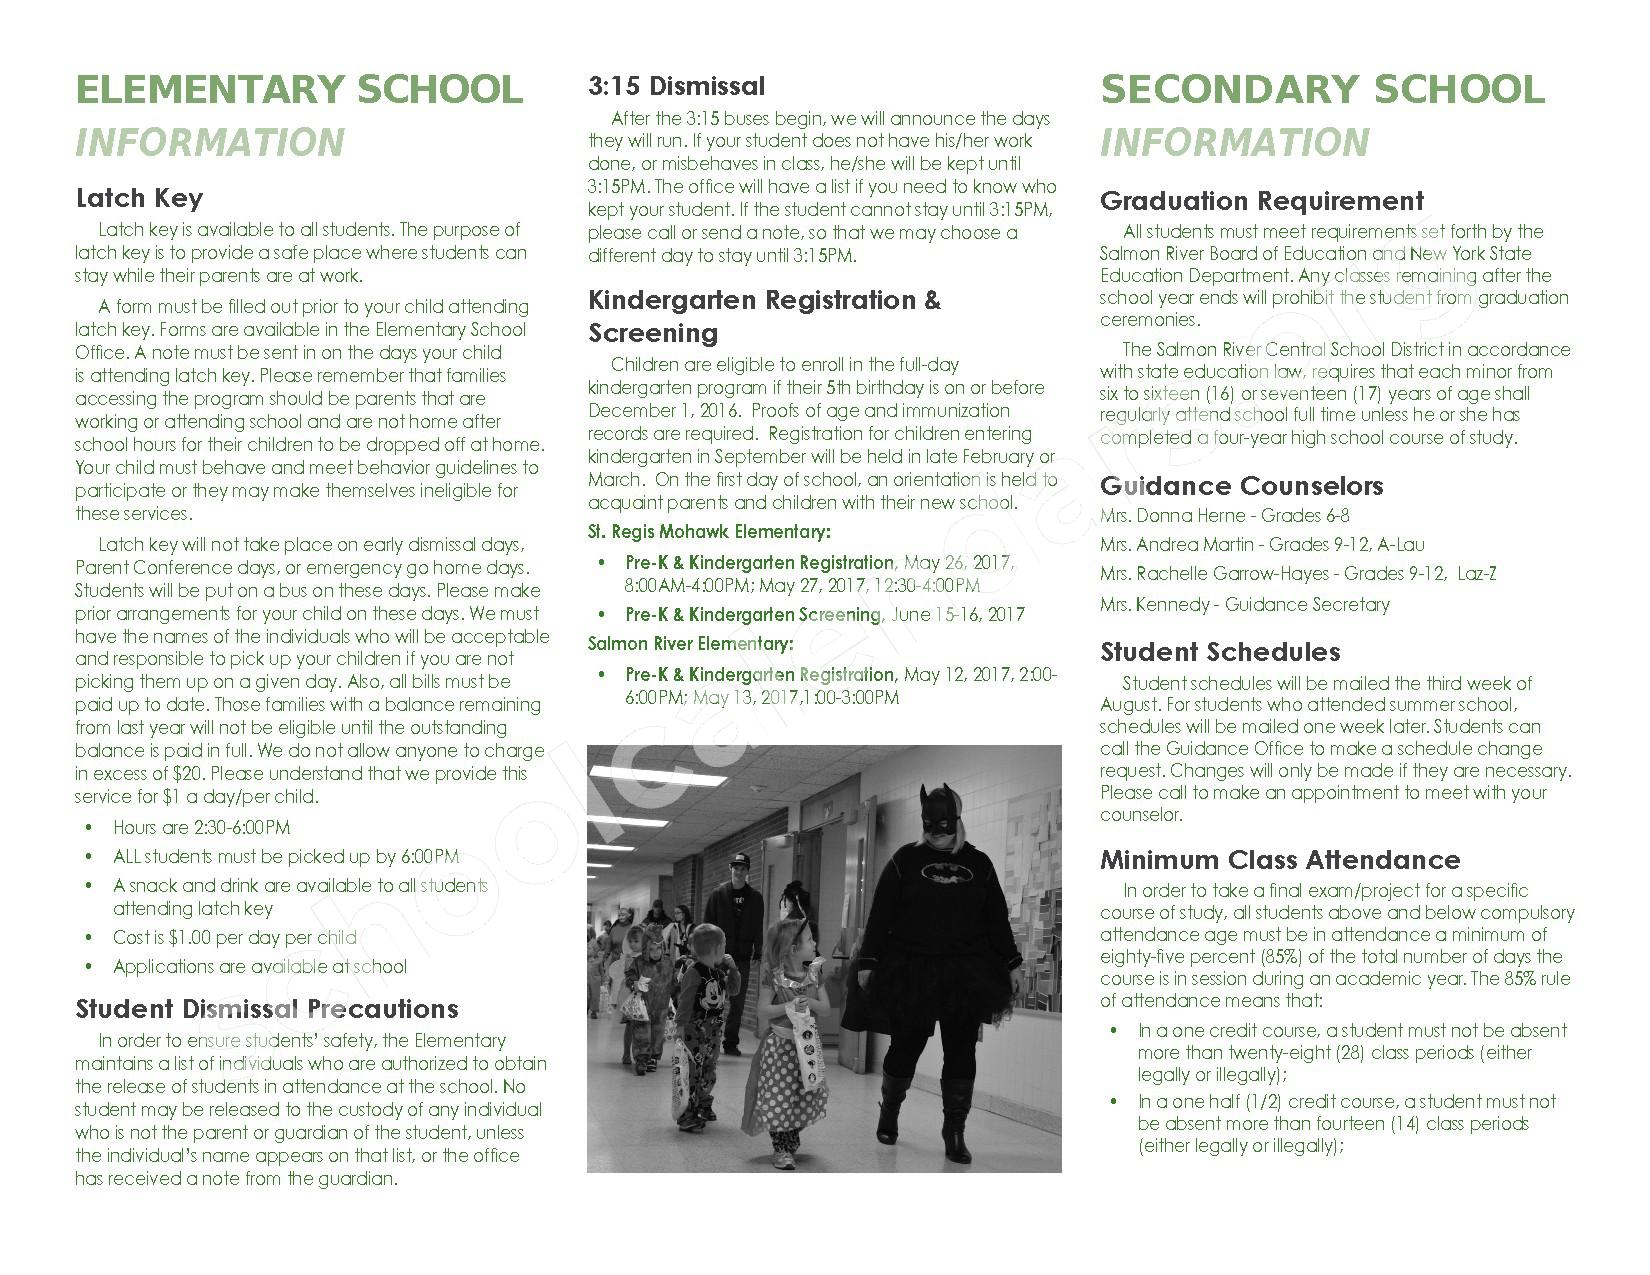 2016 - 2017 School Calendar – Salmon River Central School District – page 34